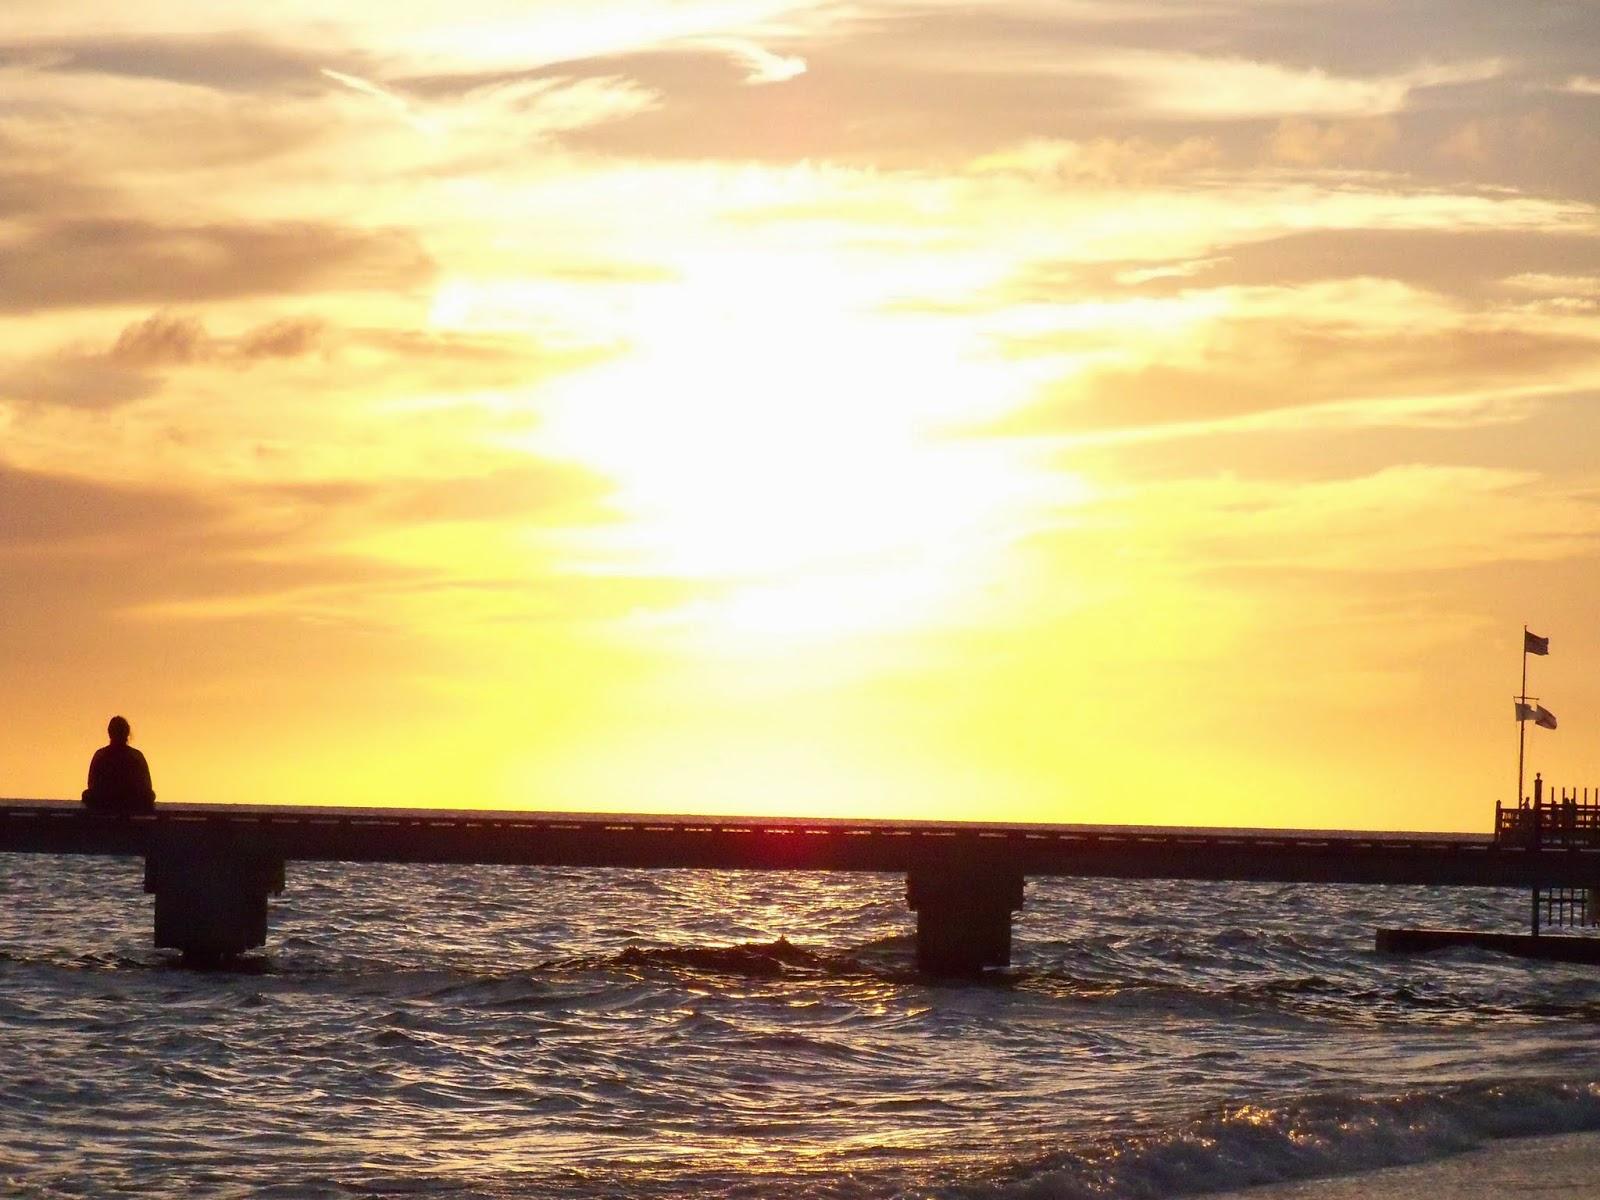 Key West Vacation - 116_5560.JPG